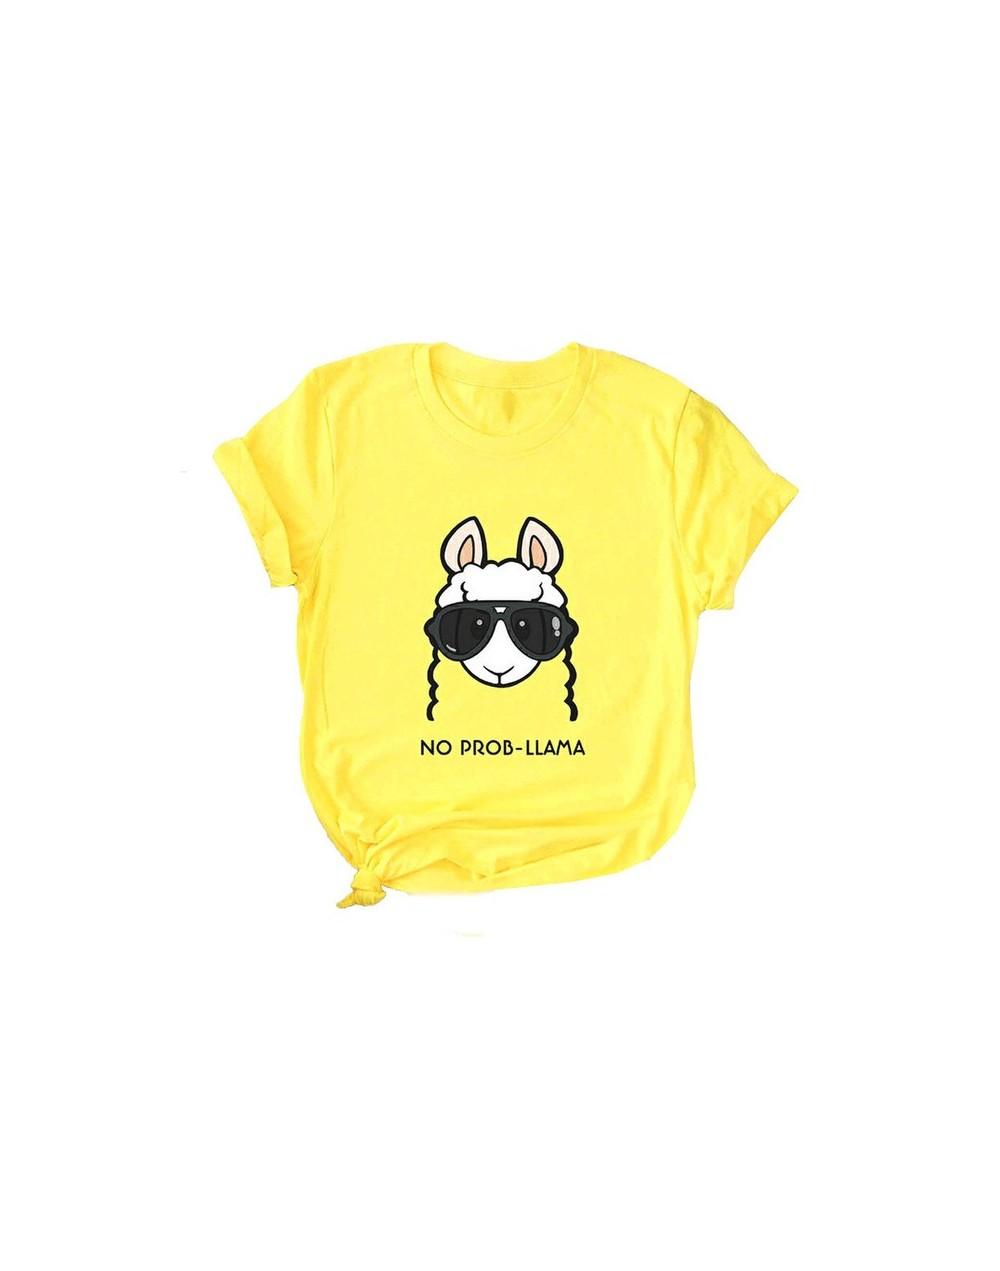 Avocado T-shirt Women T Shirts Harajuku Cartoon Pattern Printed Tee Shirts Korean tshirt Short Sleeve Tops Plus Size 3XL 4XL...